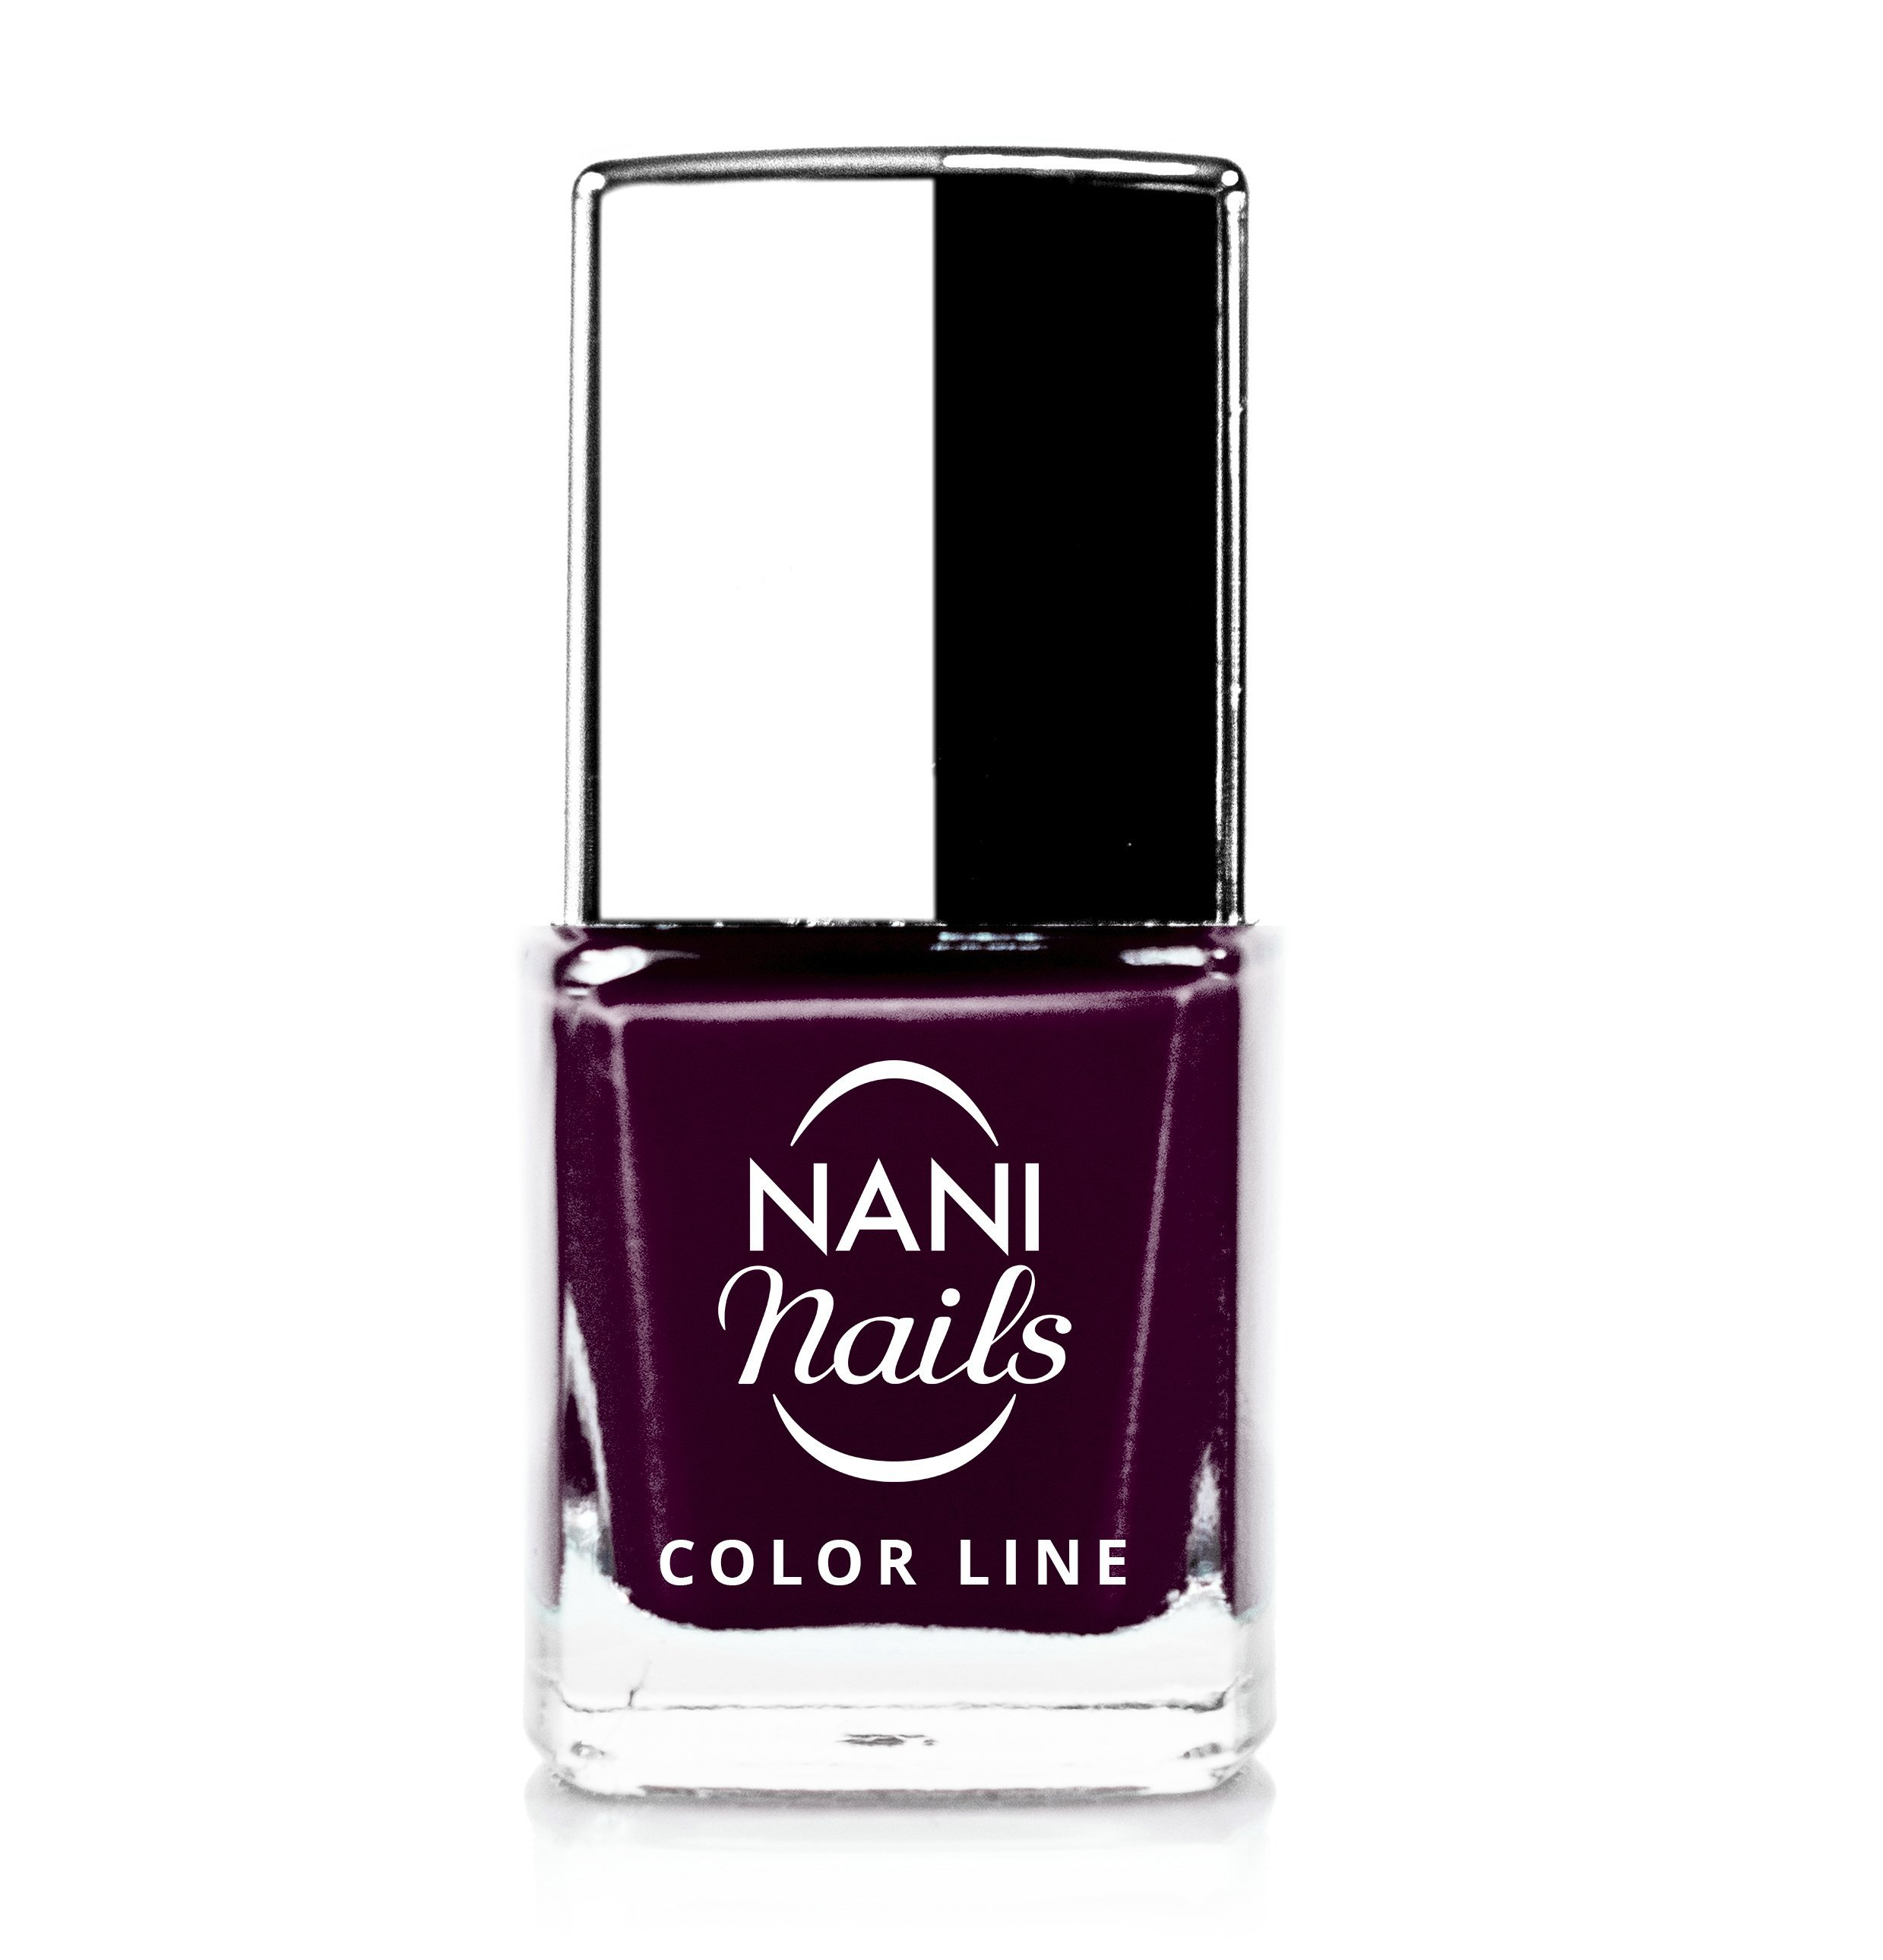 NANI lak Color Line 9 ml - 154